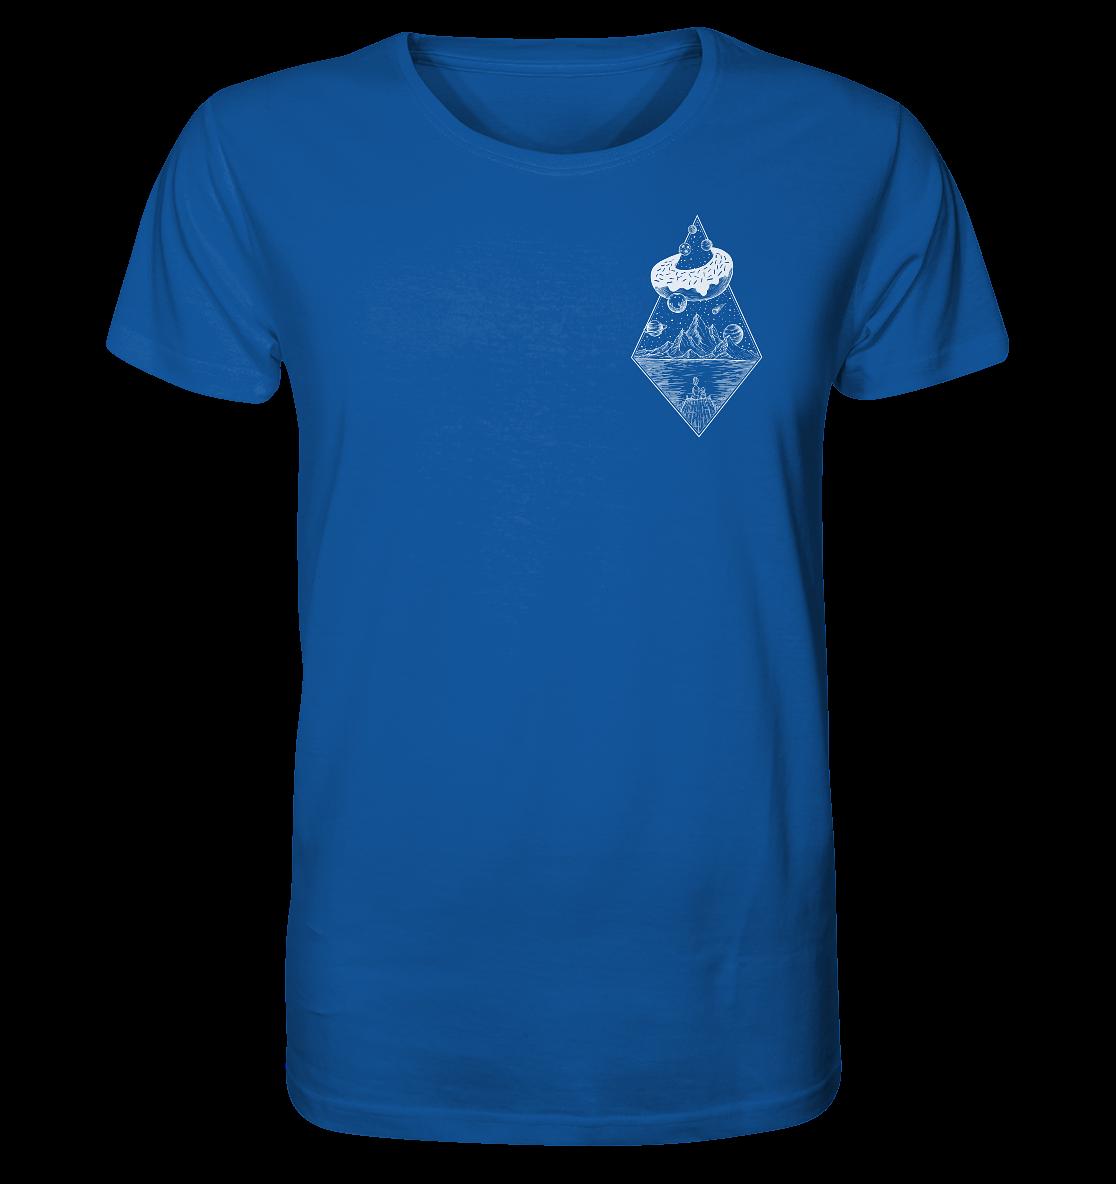 front-organic-shirt-13569c-1116x.png